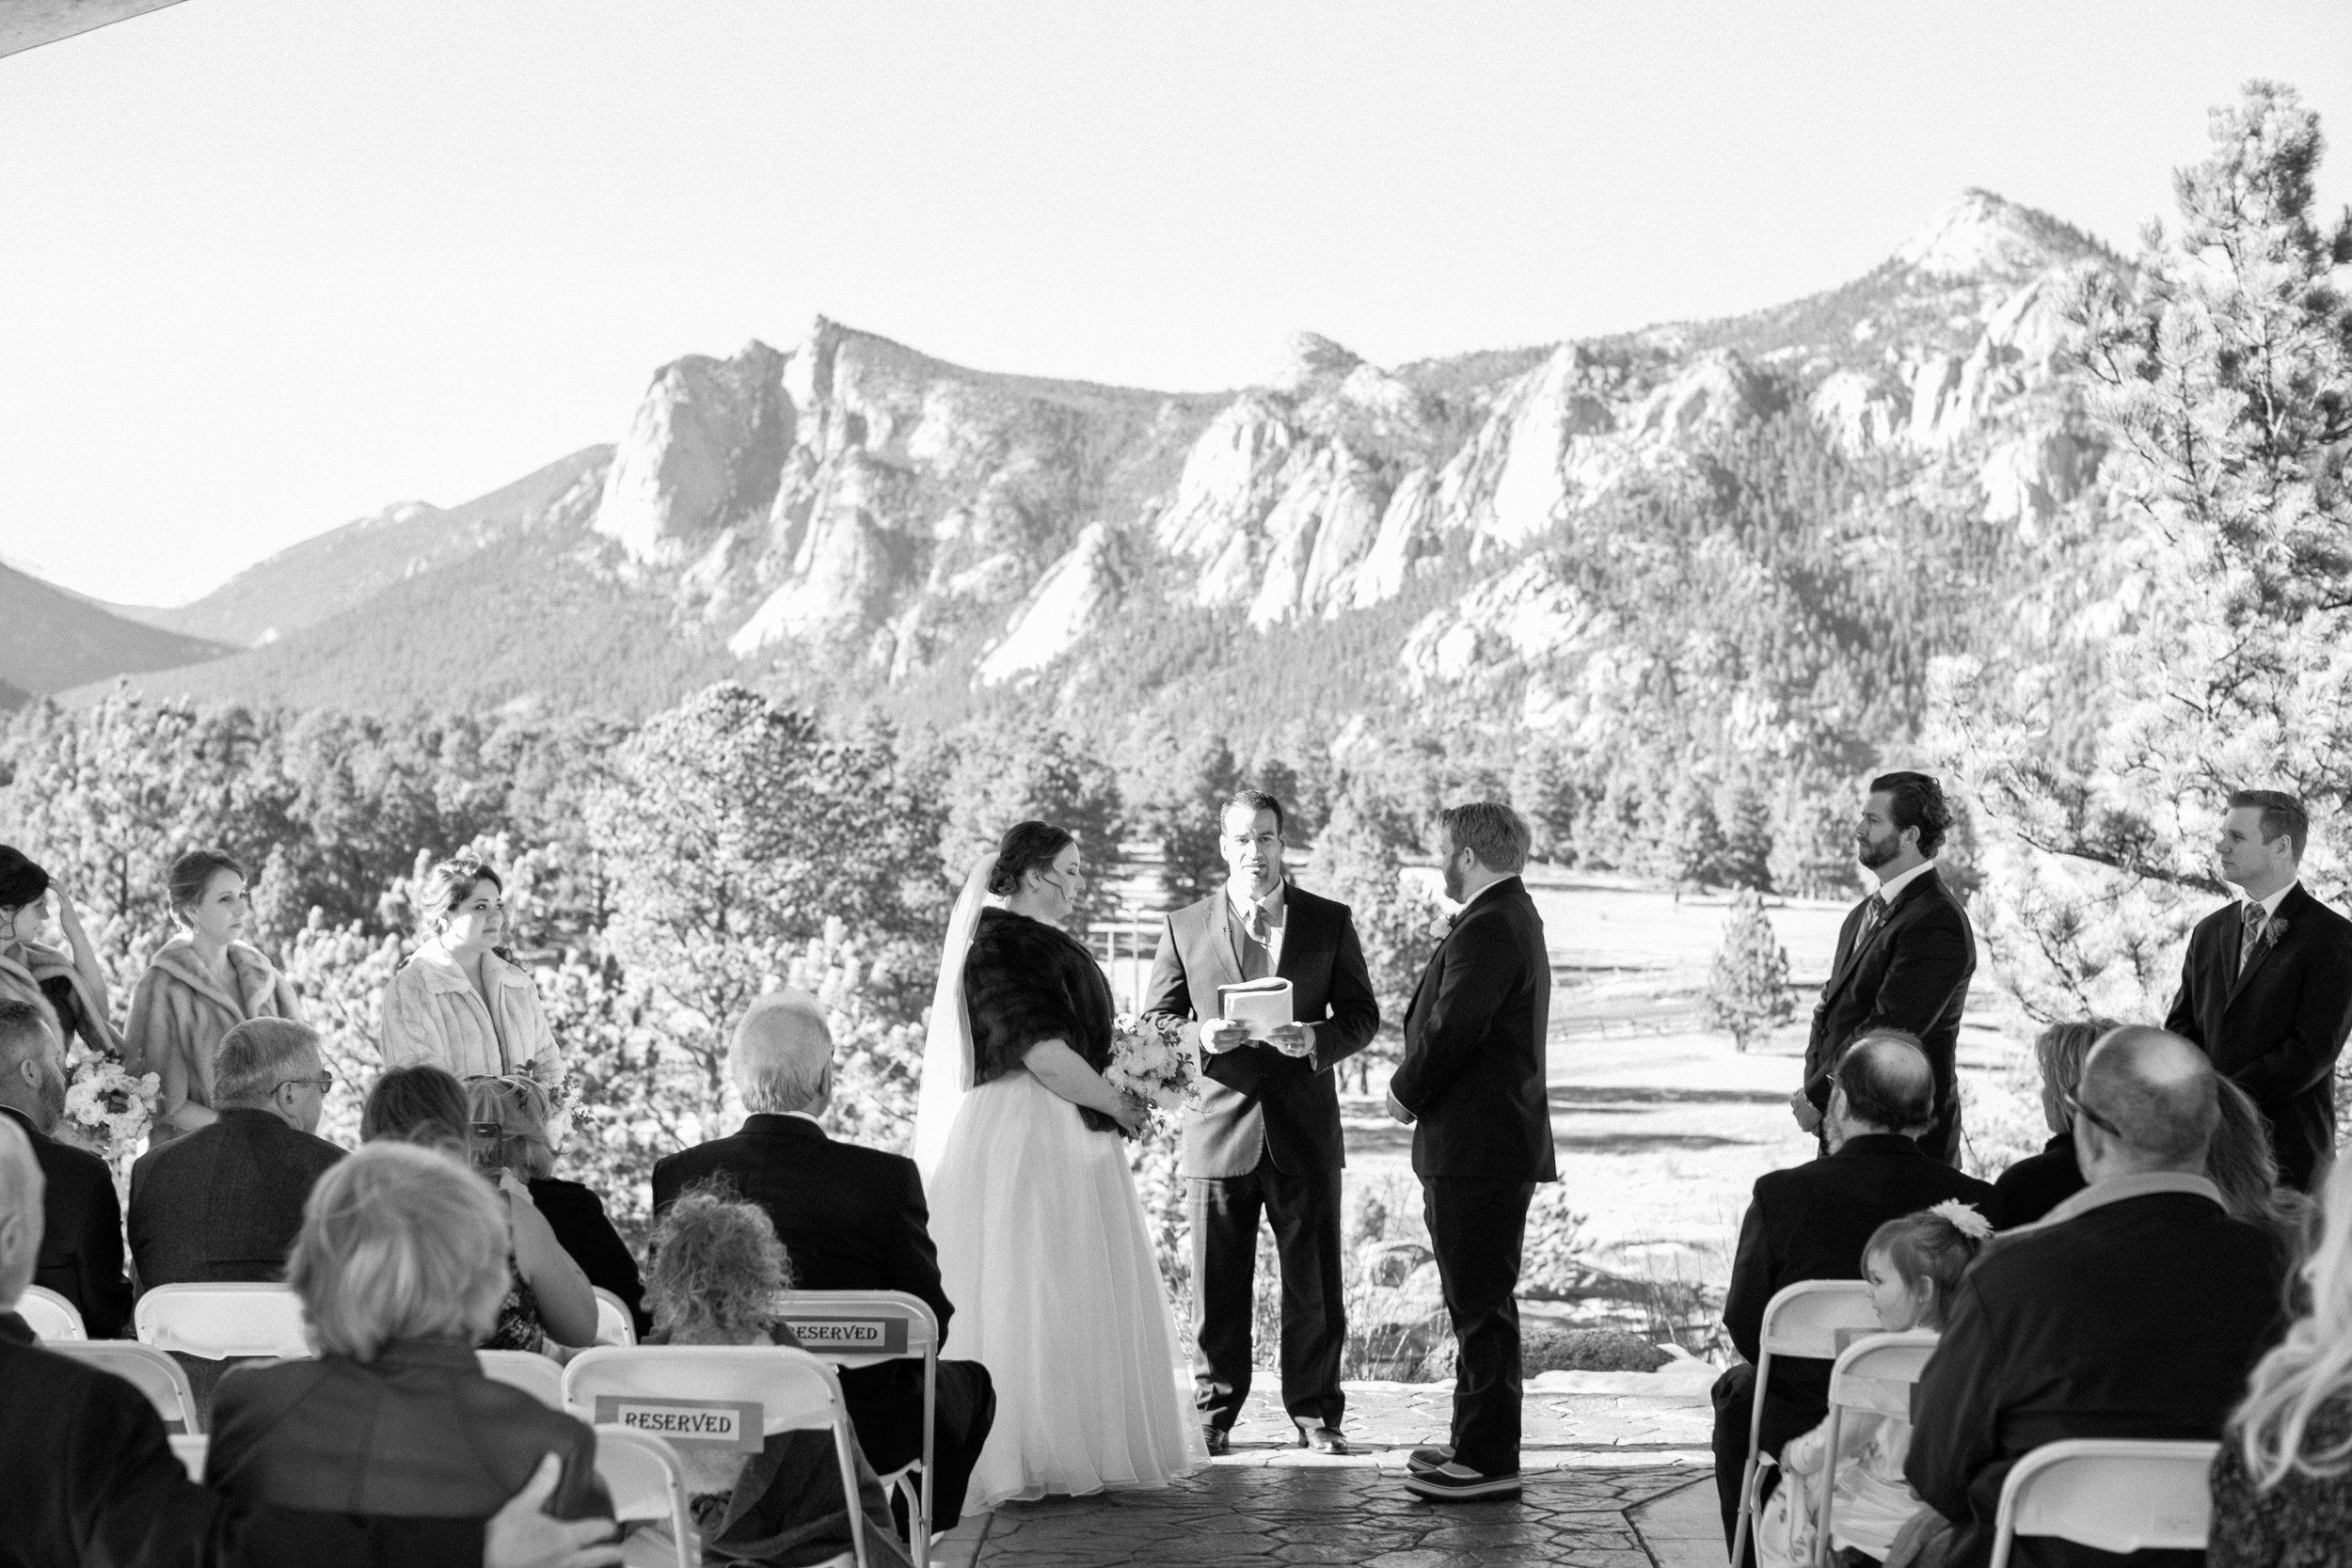 Twin_Owls_Steakhouse-wedding_photographer_Estes_Park_Lisa_ODwyer-367.jpg